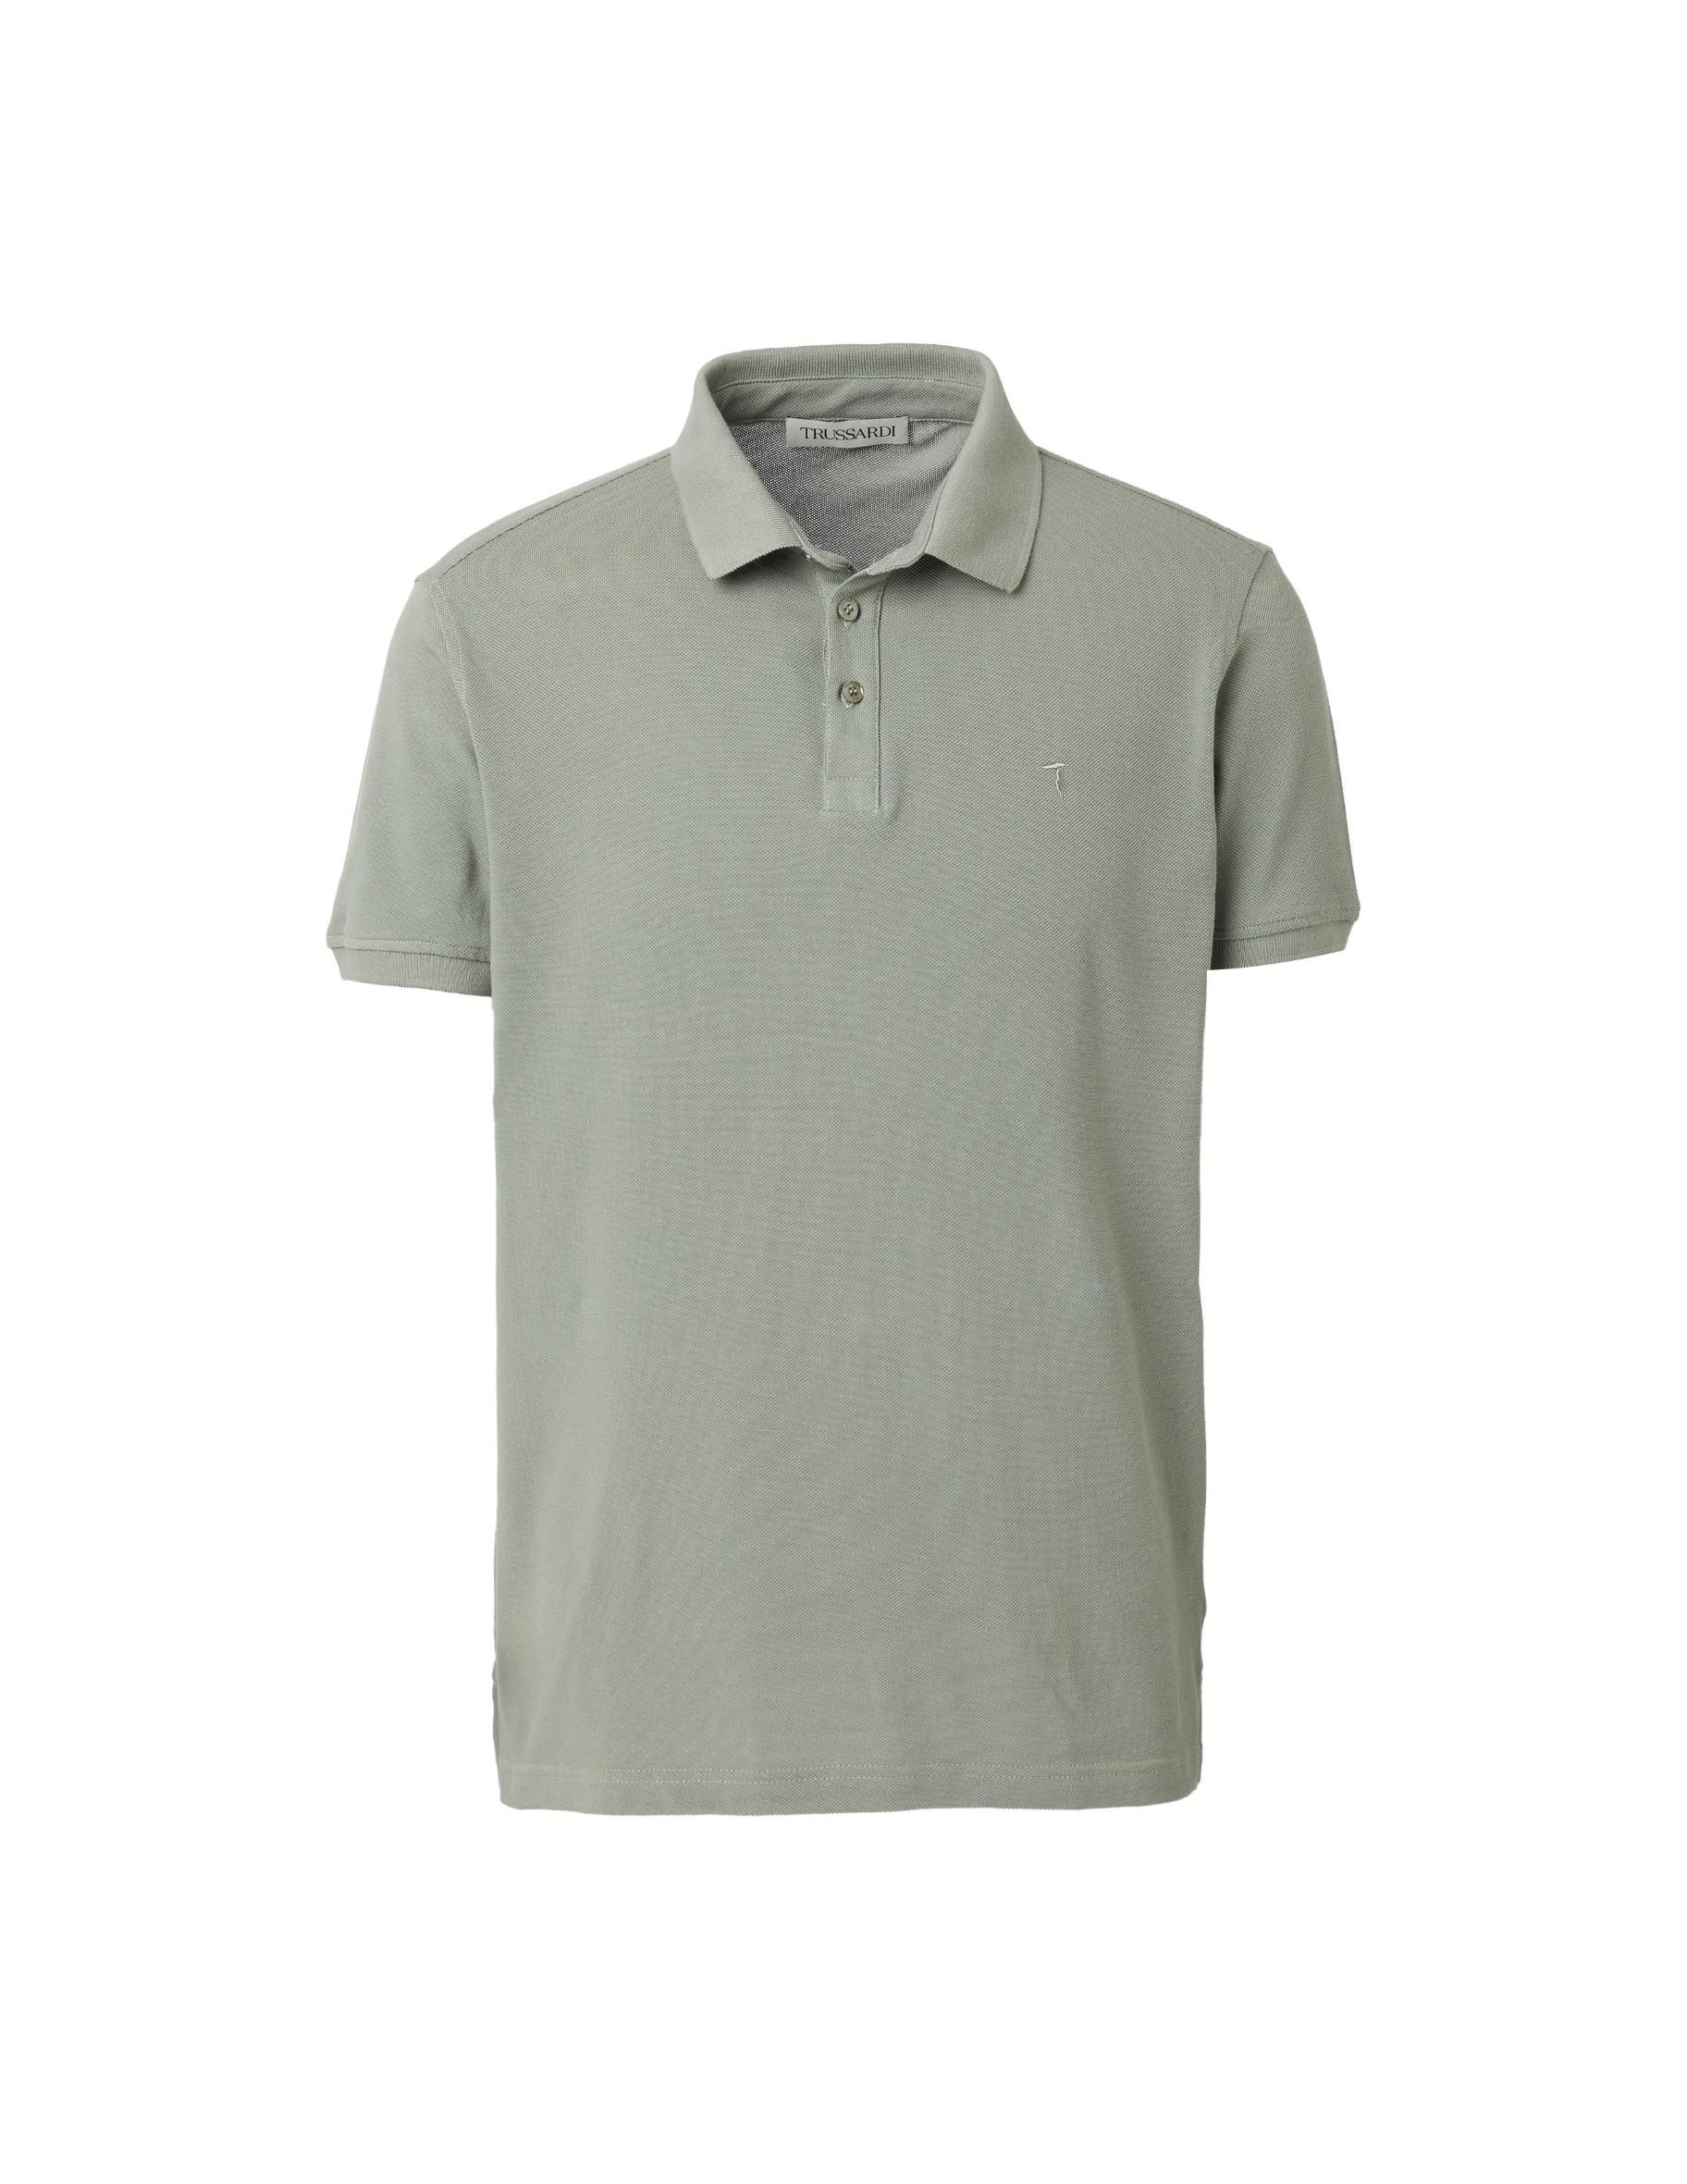 Trussardi Jeans Short Sleeves Polo Shirt Piquet Pure Cotton Regular Fit Uomo